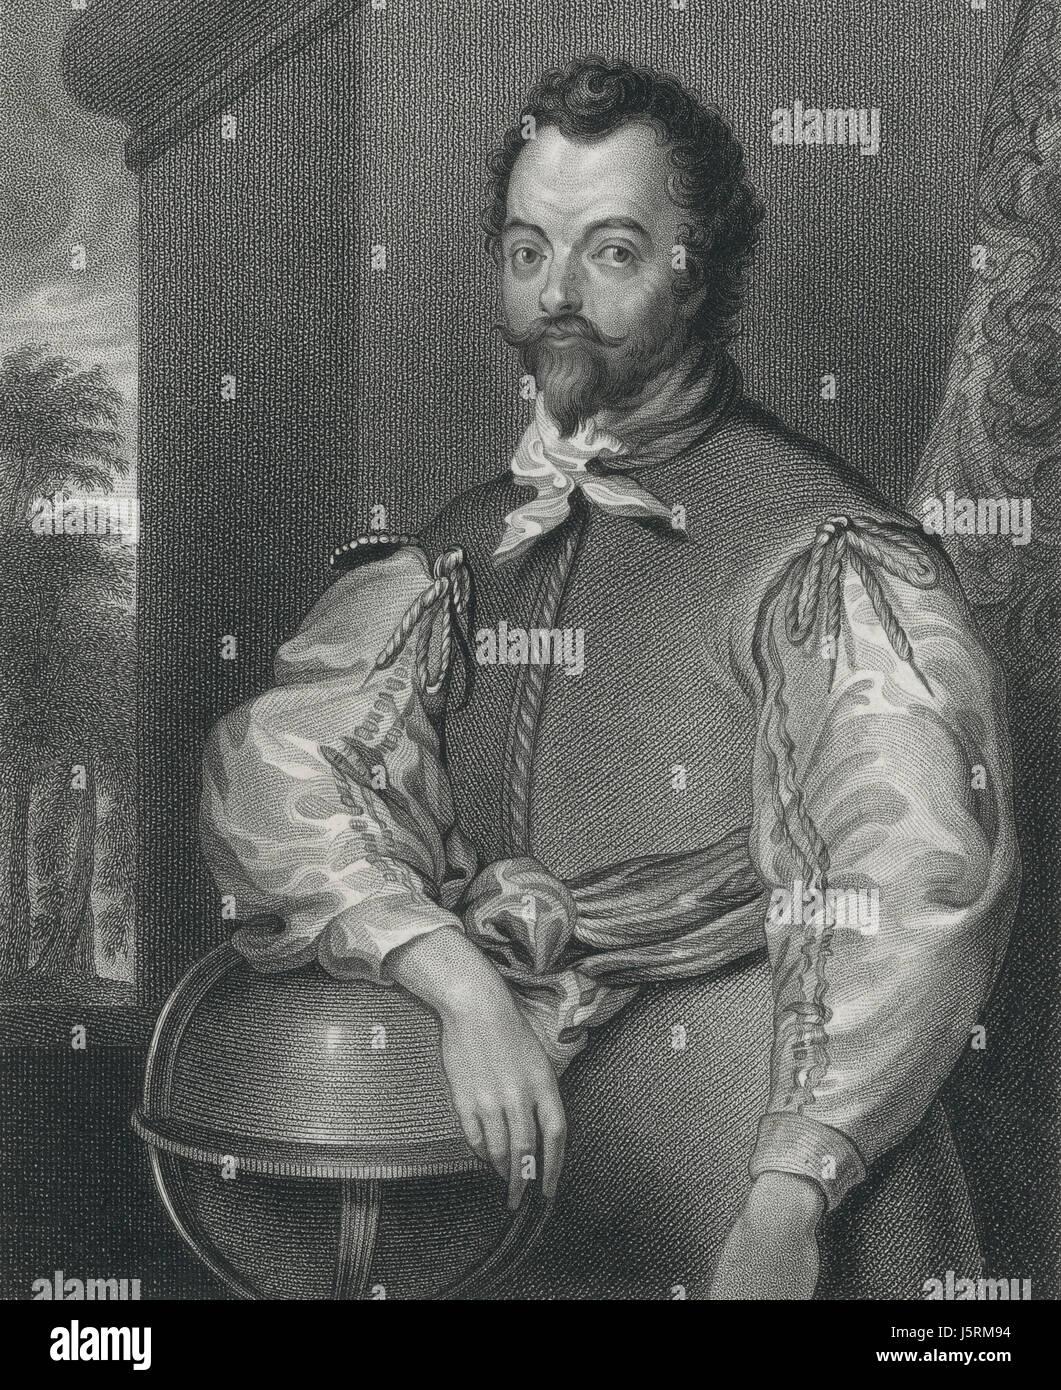 Sir Francis Drake (1540-96), English Admiral and Navigator, Portrait, Engraved by S. Freeman, 1829 - Stock Image